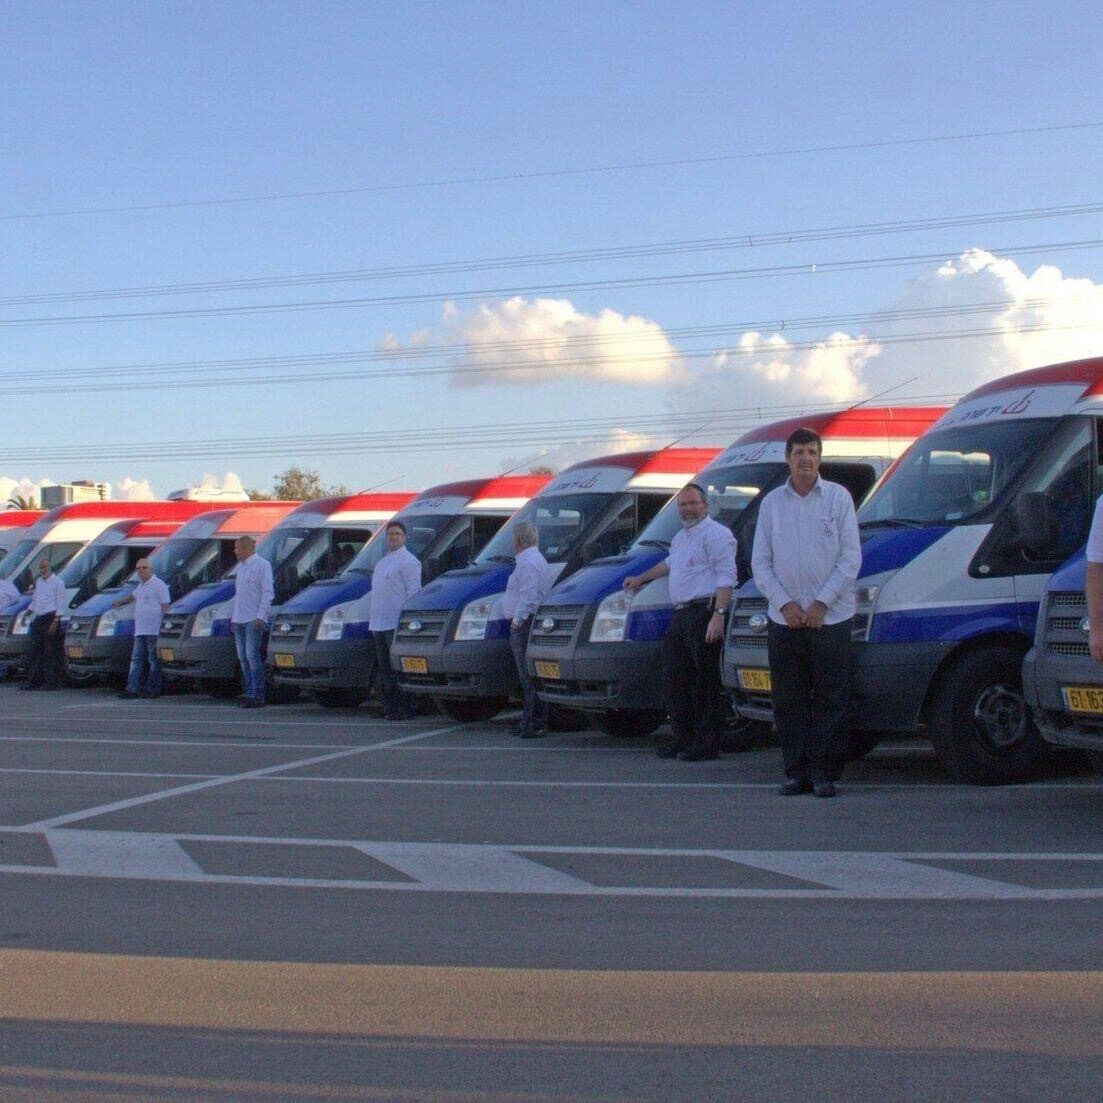 Fleet of Nechoniot Vans for the Disabled